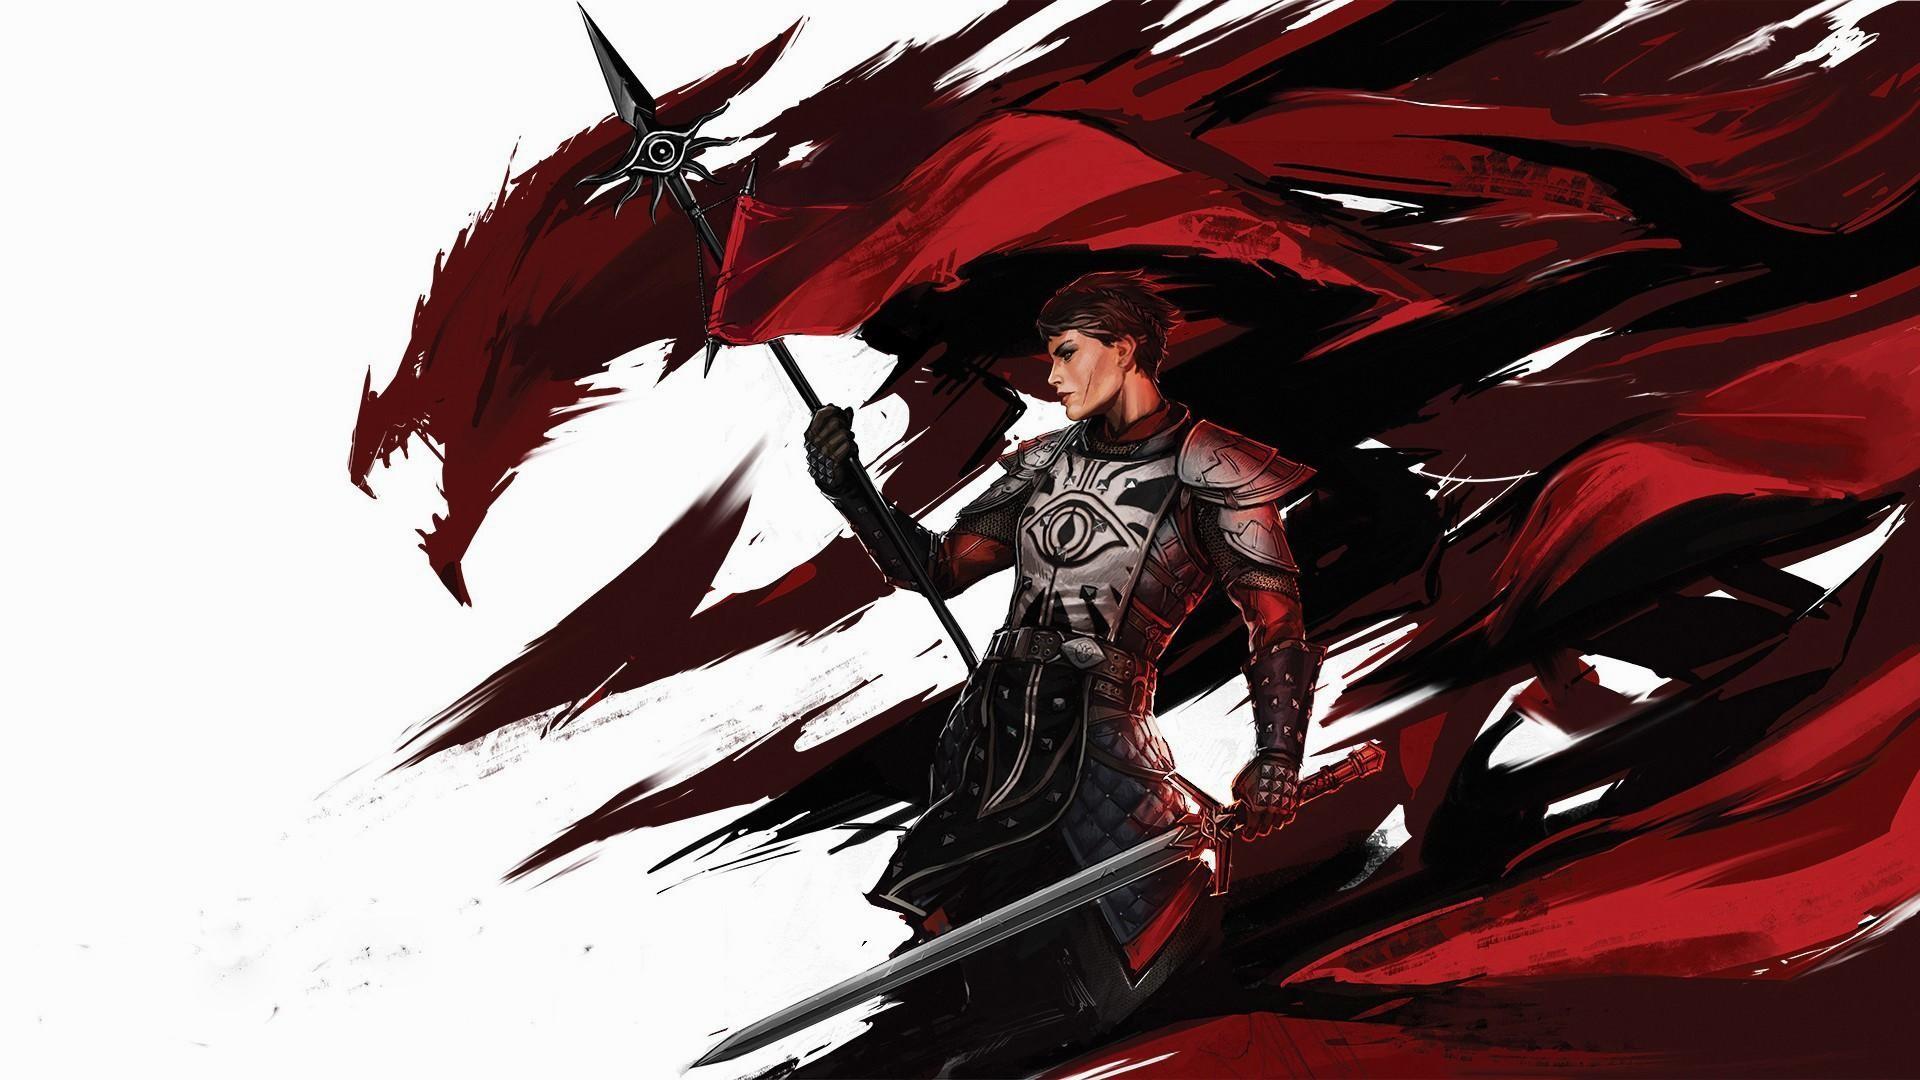 General-1920×1080-video-games-Dragon-Age-Inquisition-Cassandra-